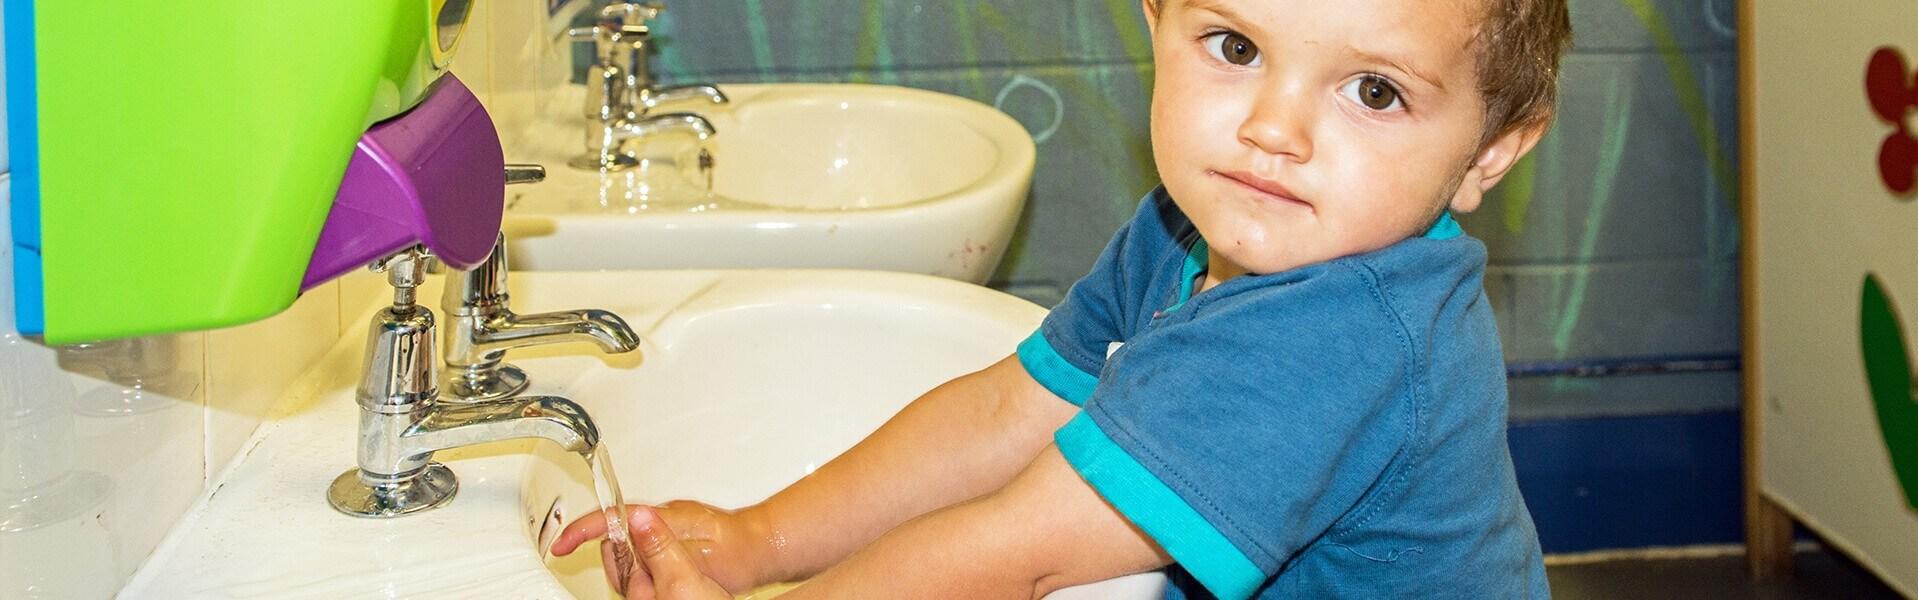 Barry Nursery Childcare